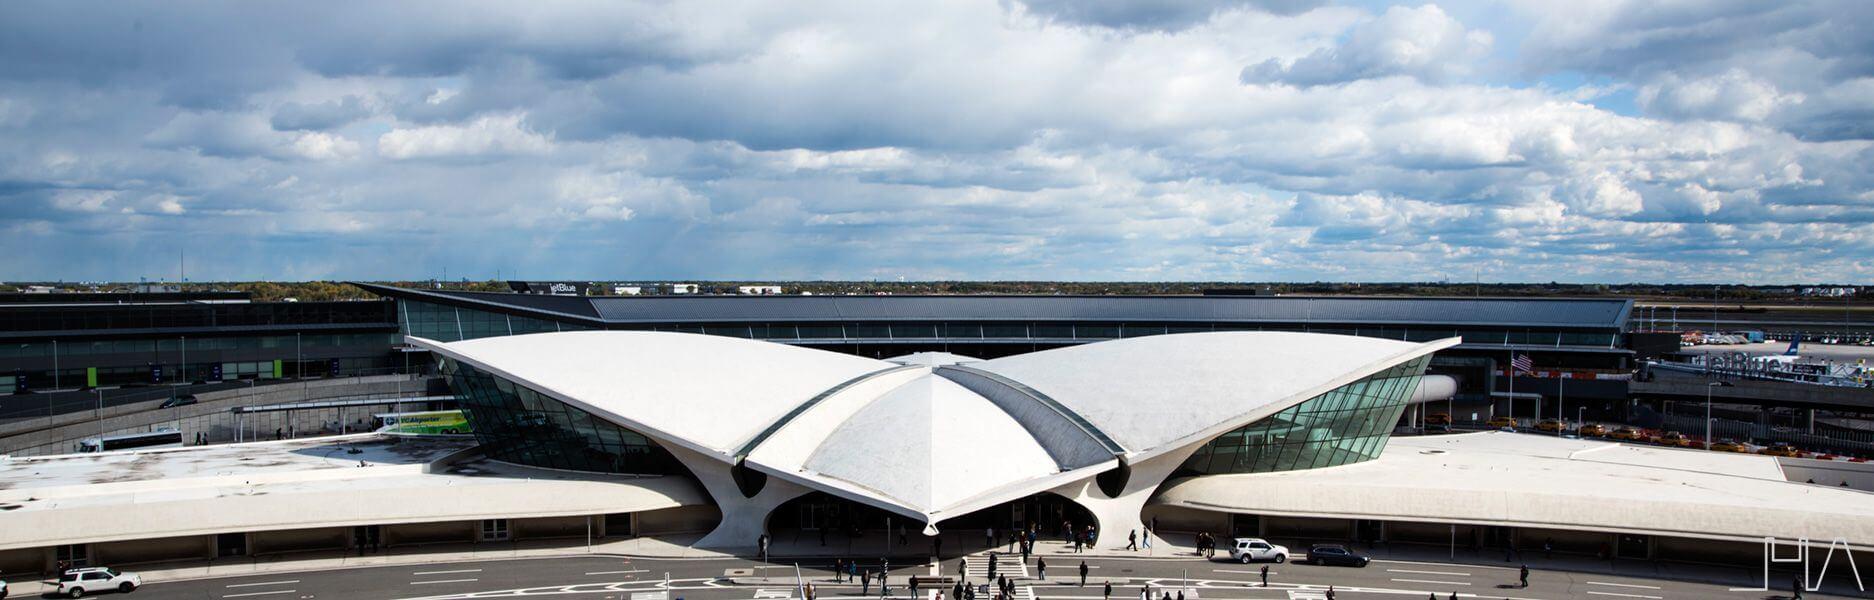 TWA FLIGHT CENTER  A majestic bird of concrete in New York